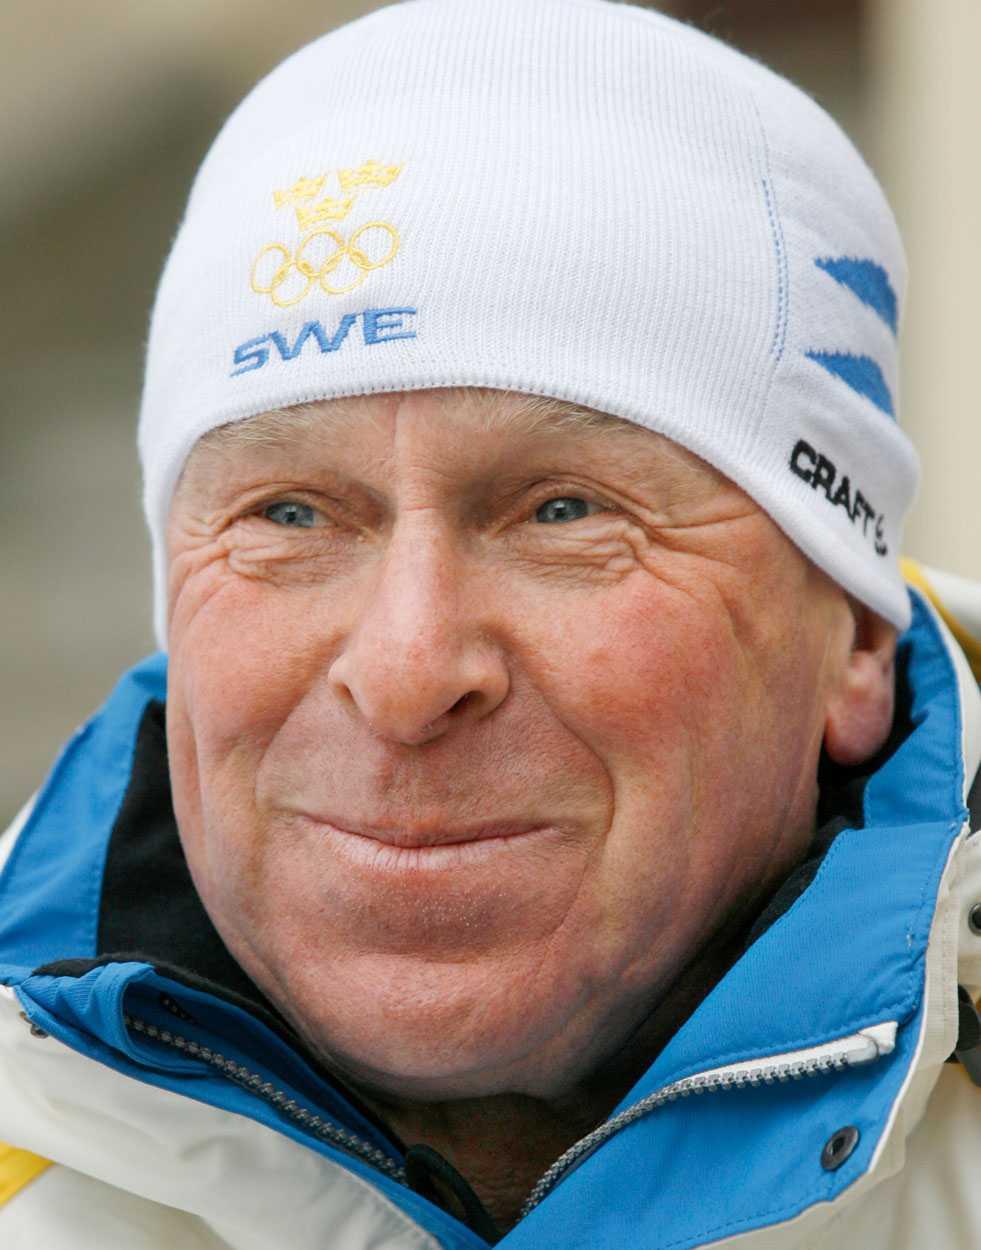 Inge Bråten blev 63 år gammal.